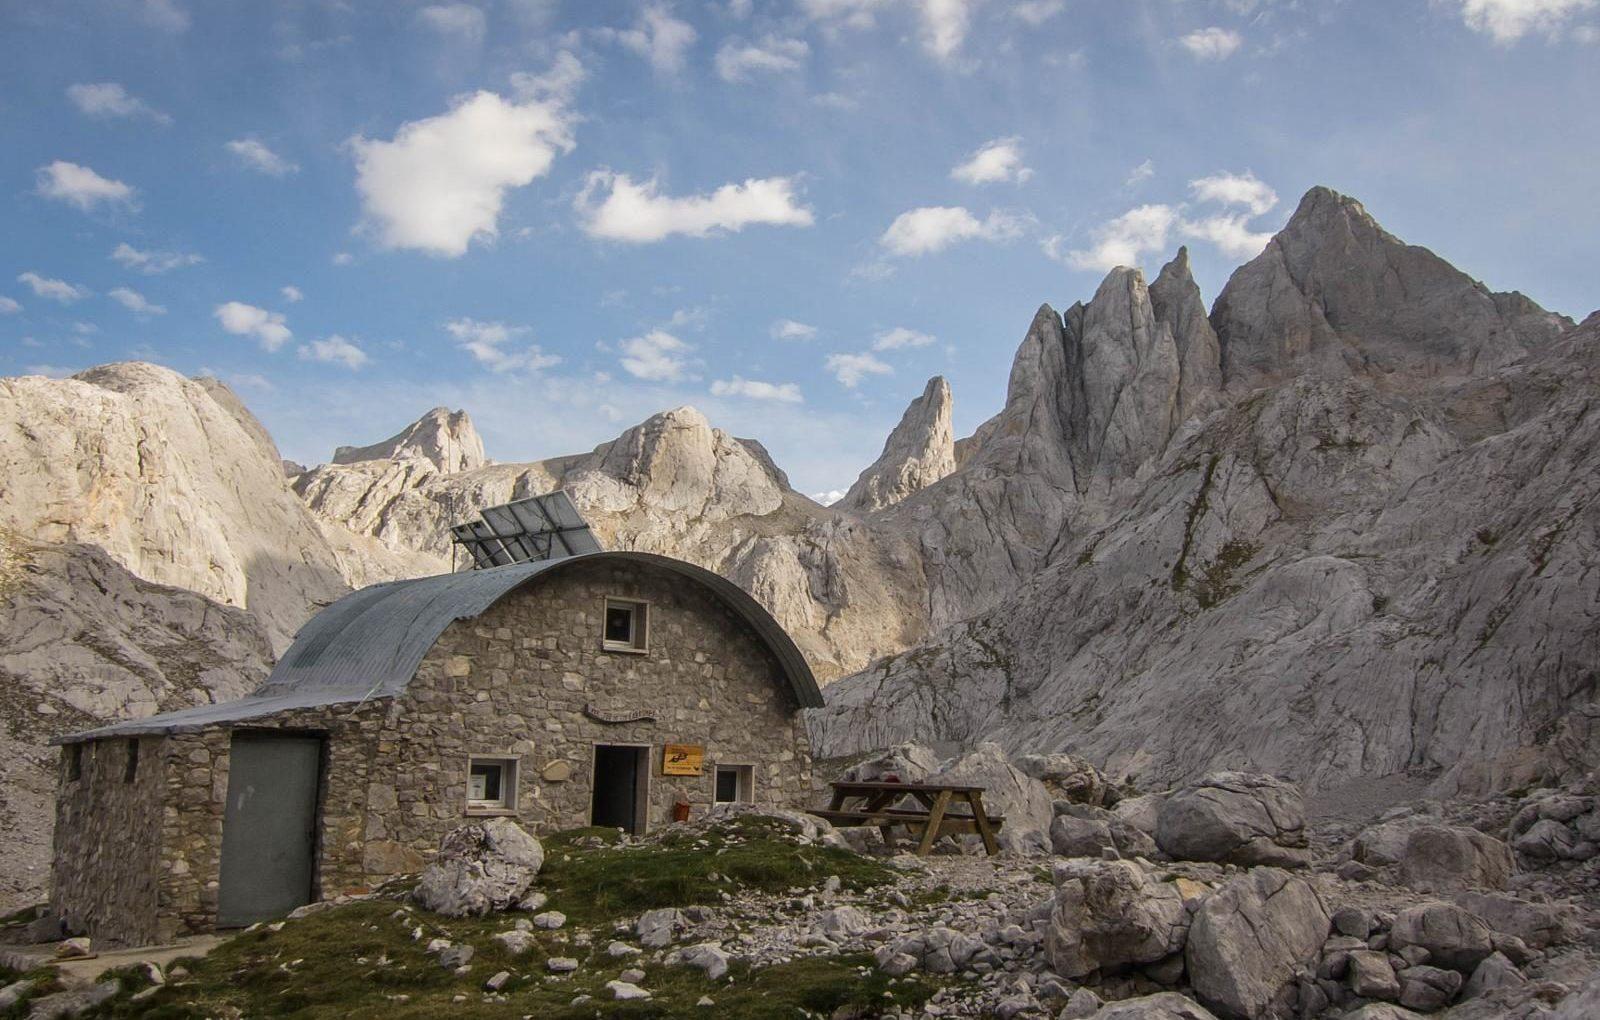 joucabronesrefugio e1587490238777 - Where to rest-Picos de Europa